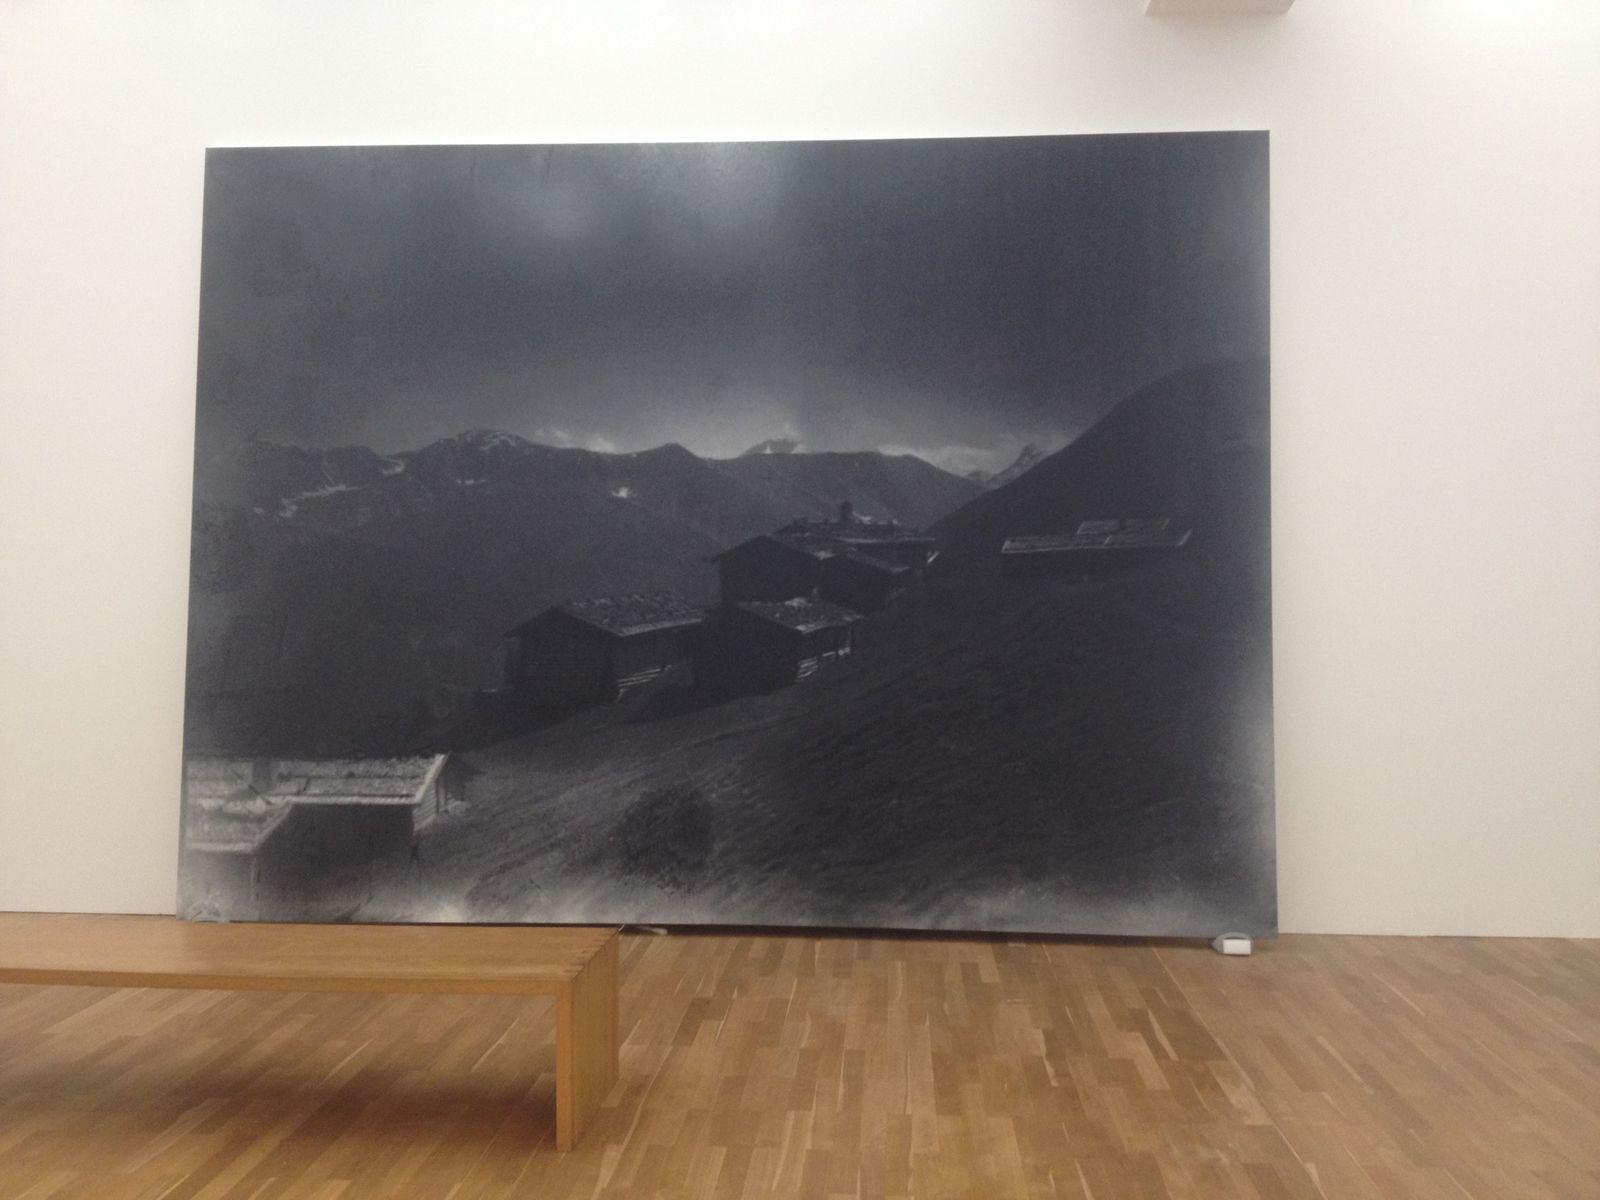 Rudolf Stingel, Untitled (nach E. L. Kirchner), (2008), © Courtesy of the Artist